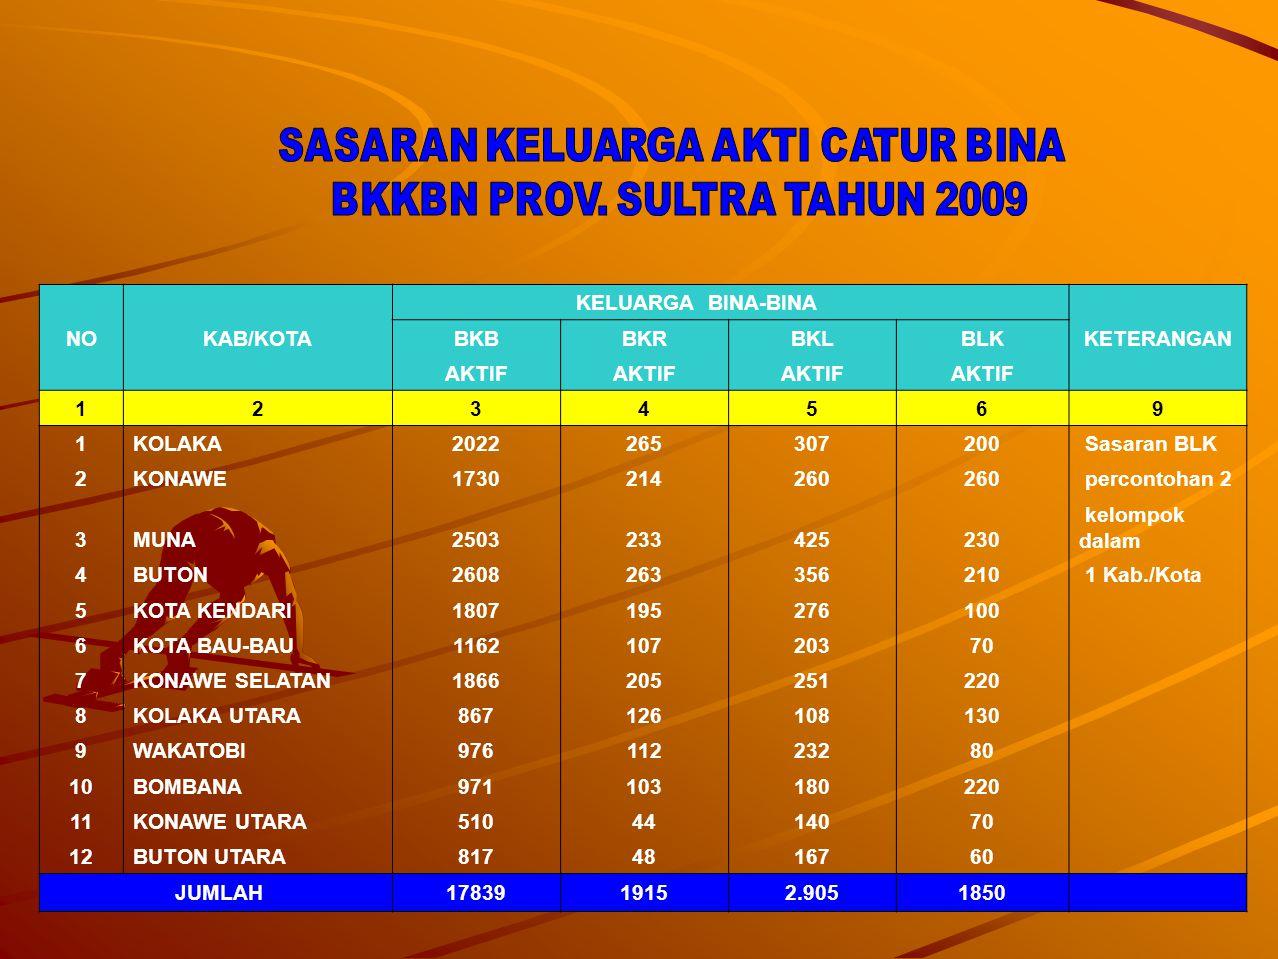 SASARAN KELUARGA AKTI CATUR BINA BKKBN PROV. SULTRA TAHUN 2009